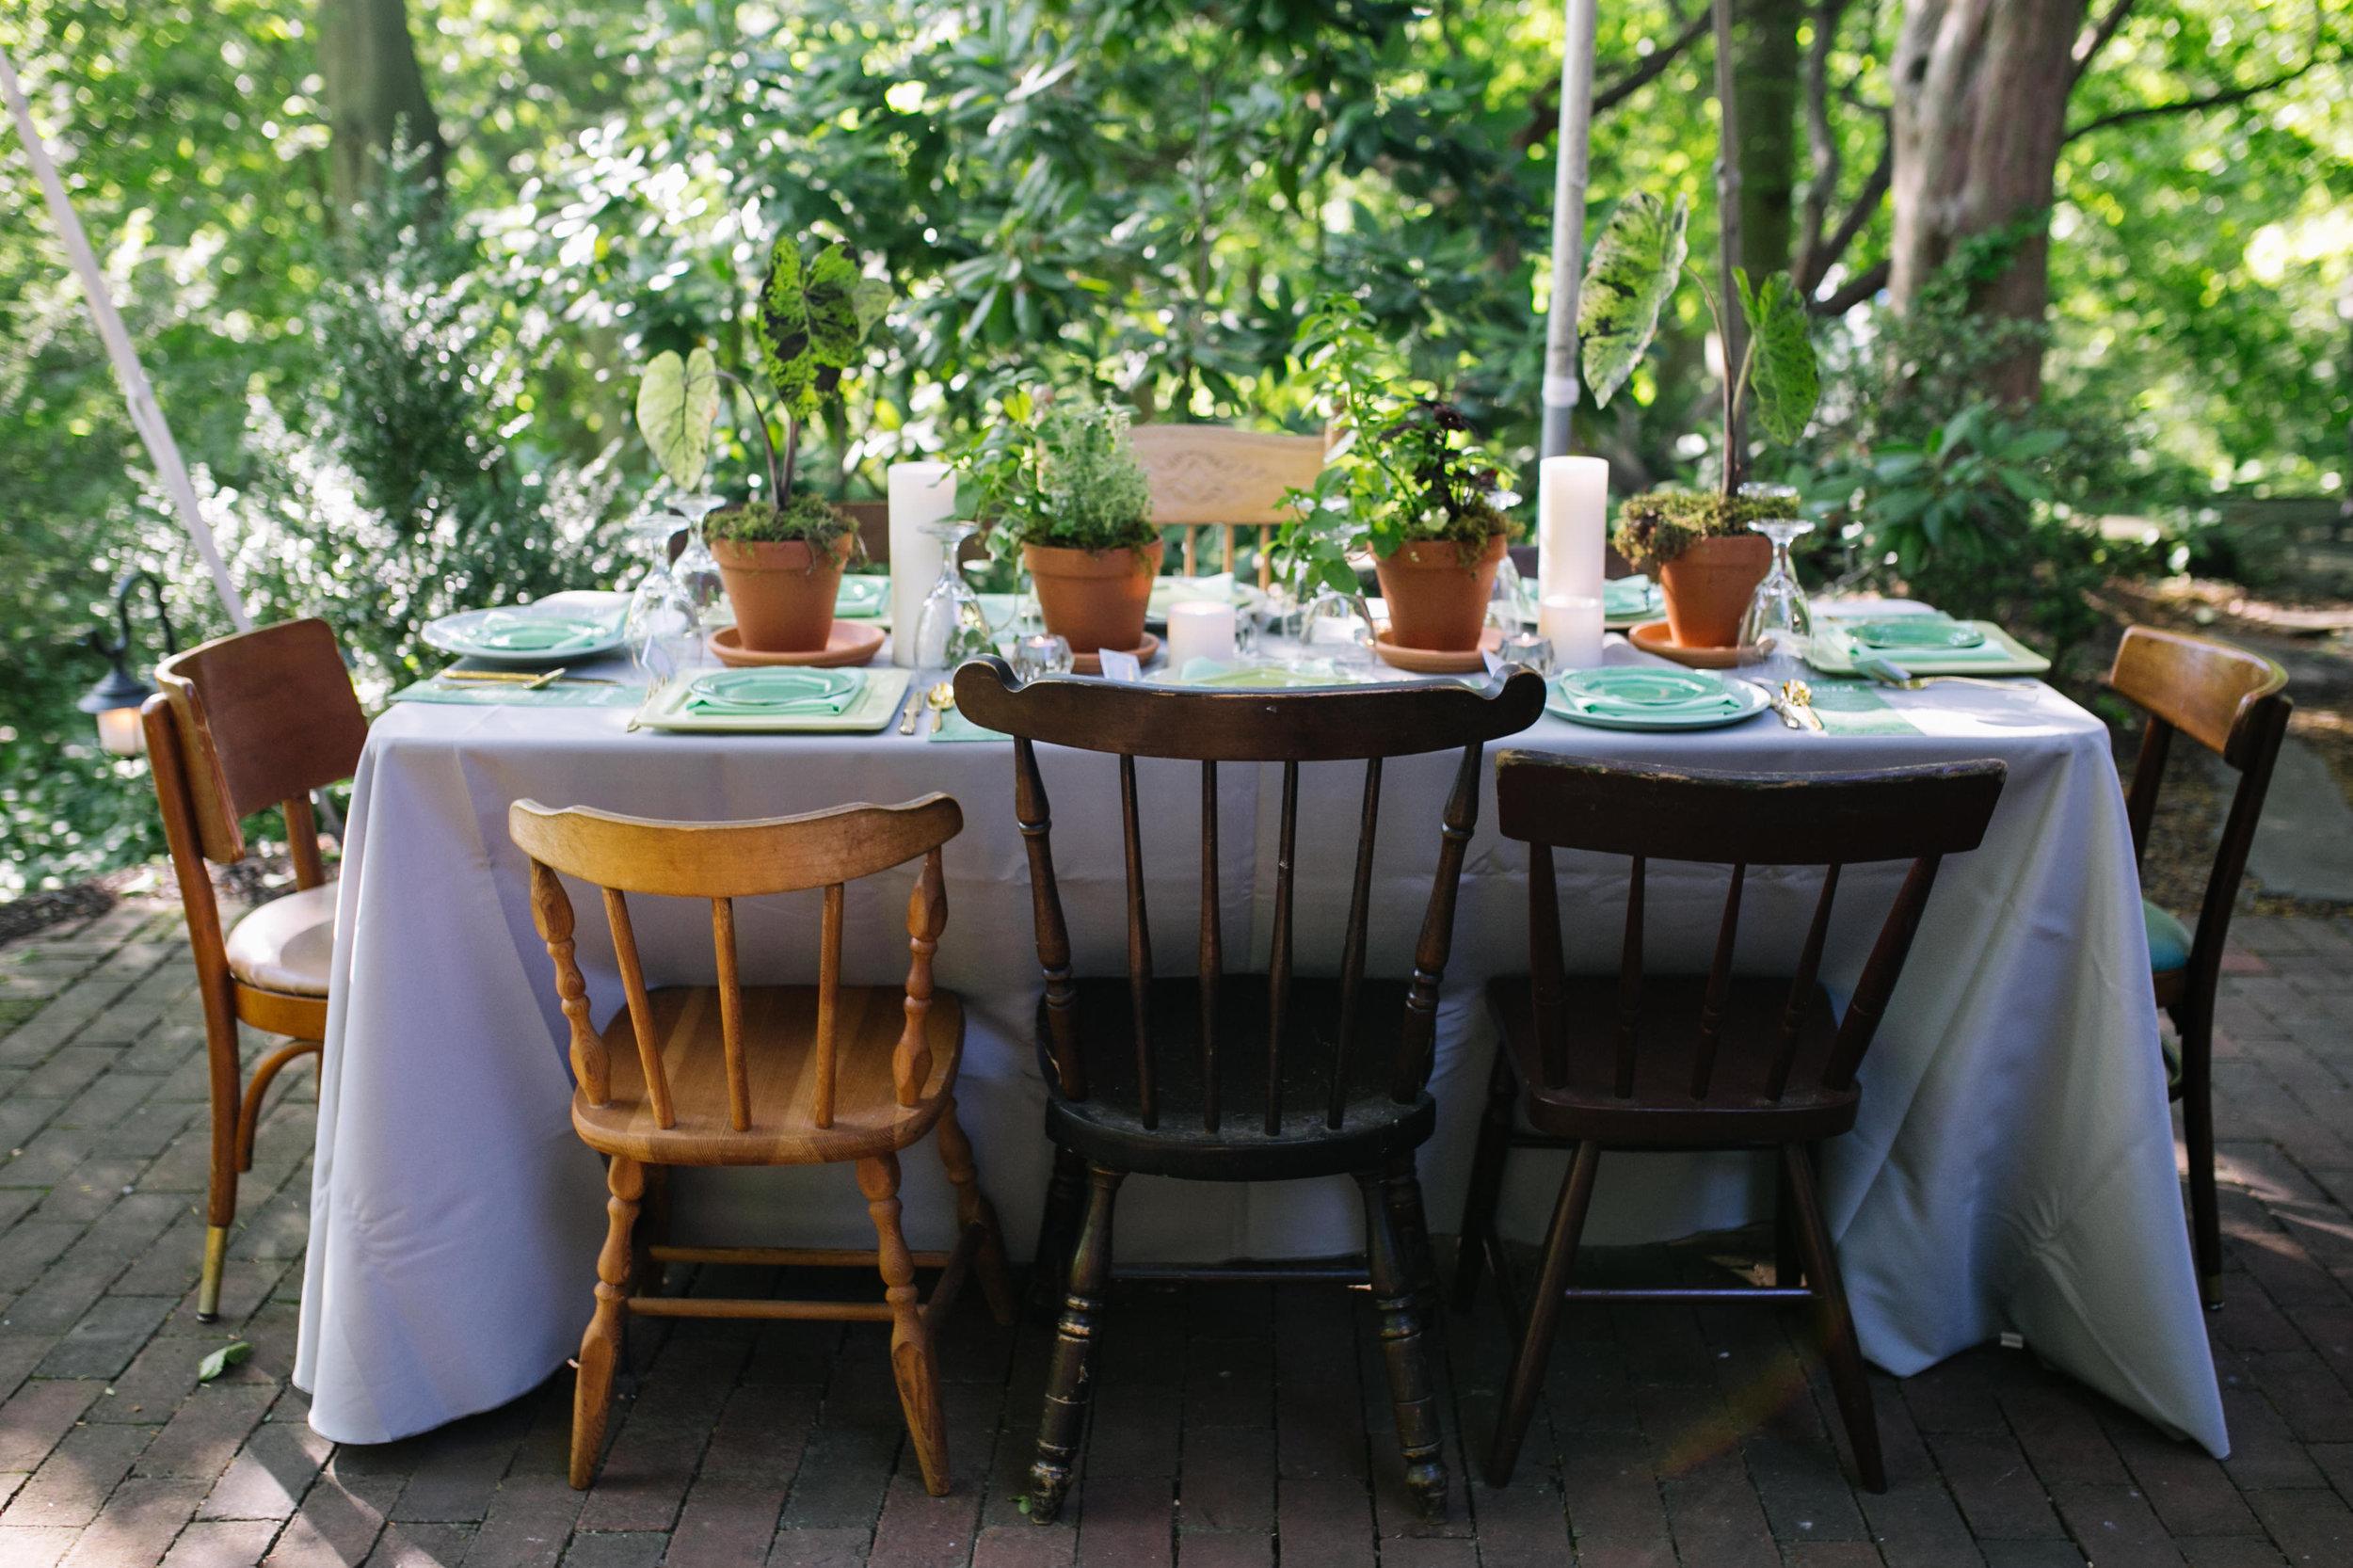 West-Chester-PA-Faunbrook-Harvest-Dinner-Series-Mint-BrittneyRaine-8.JPG